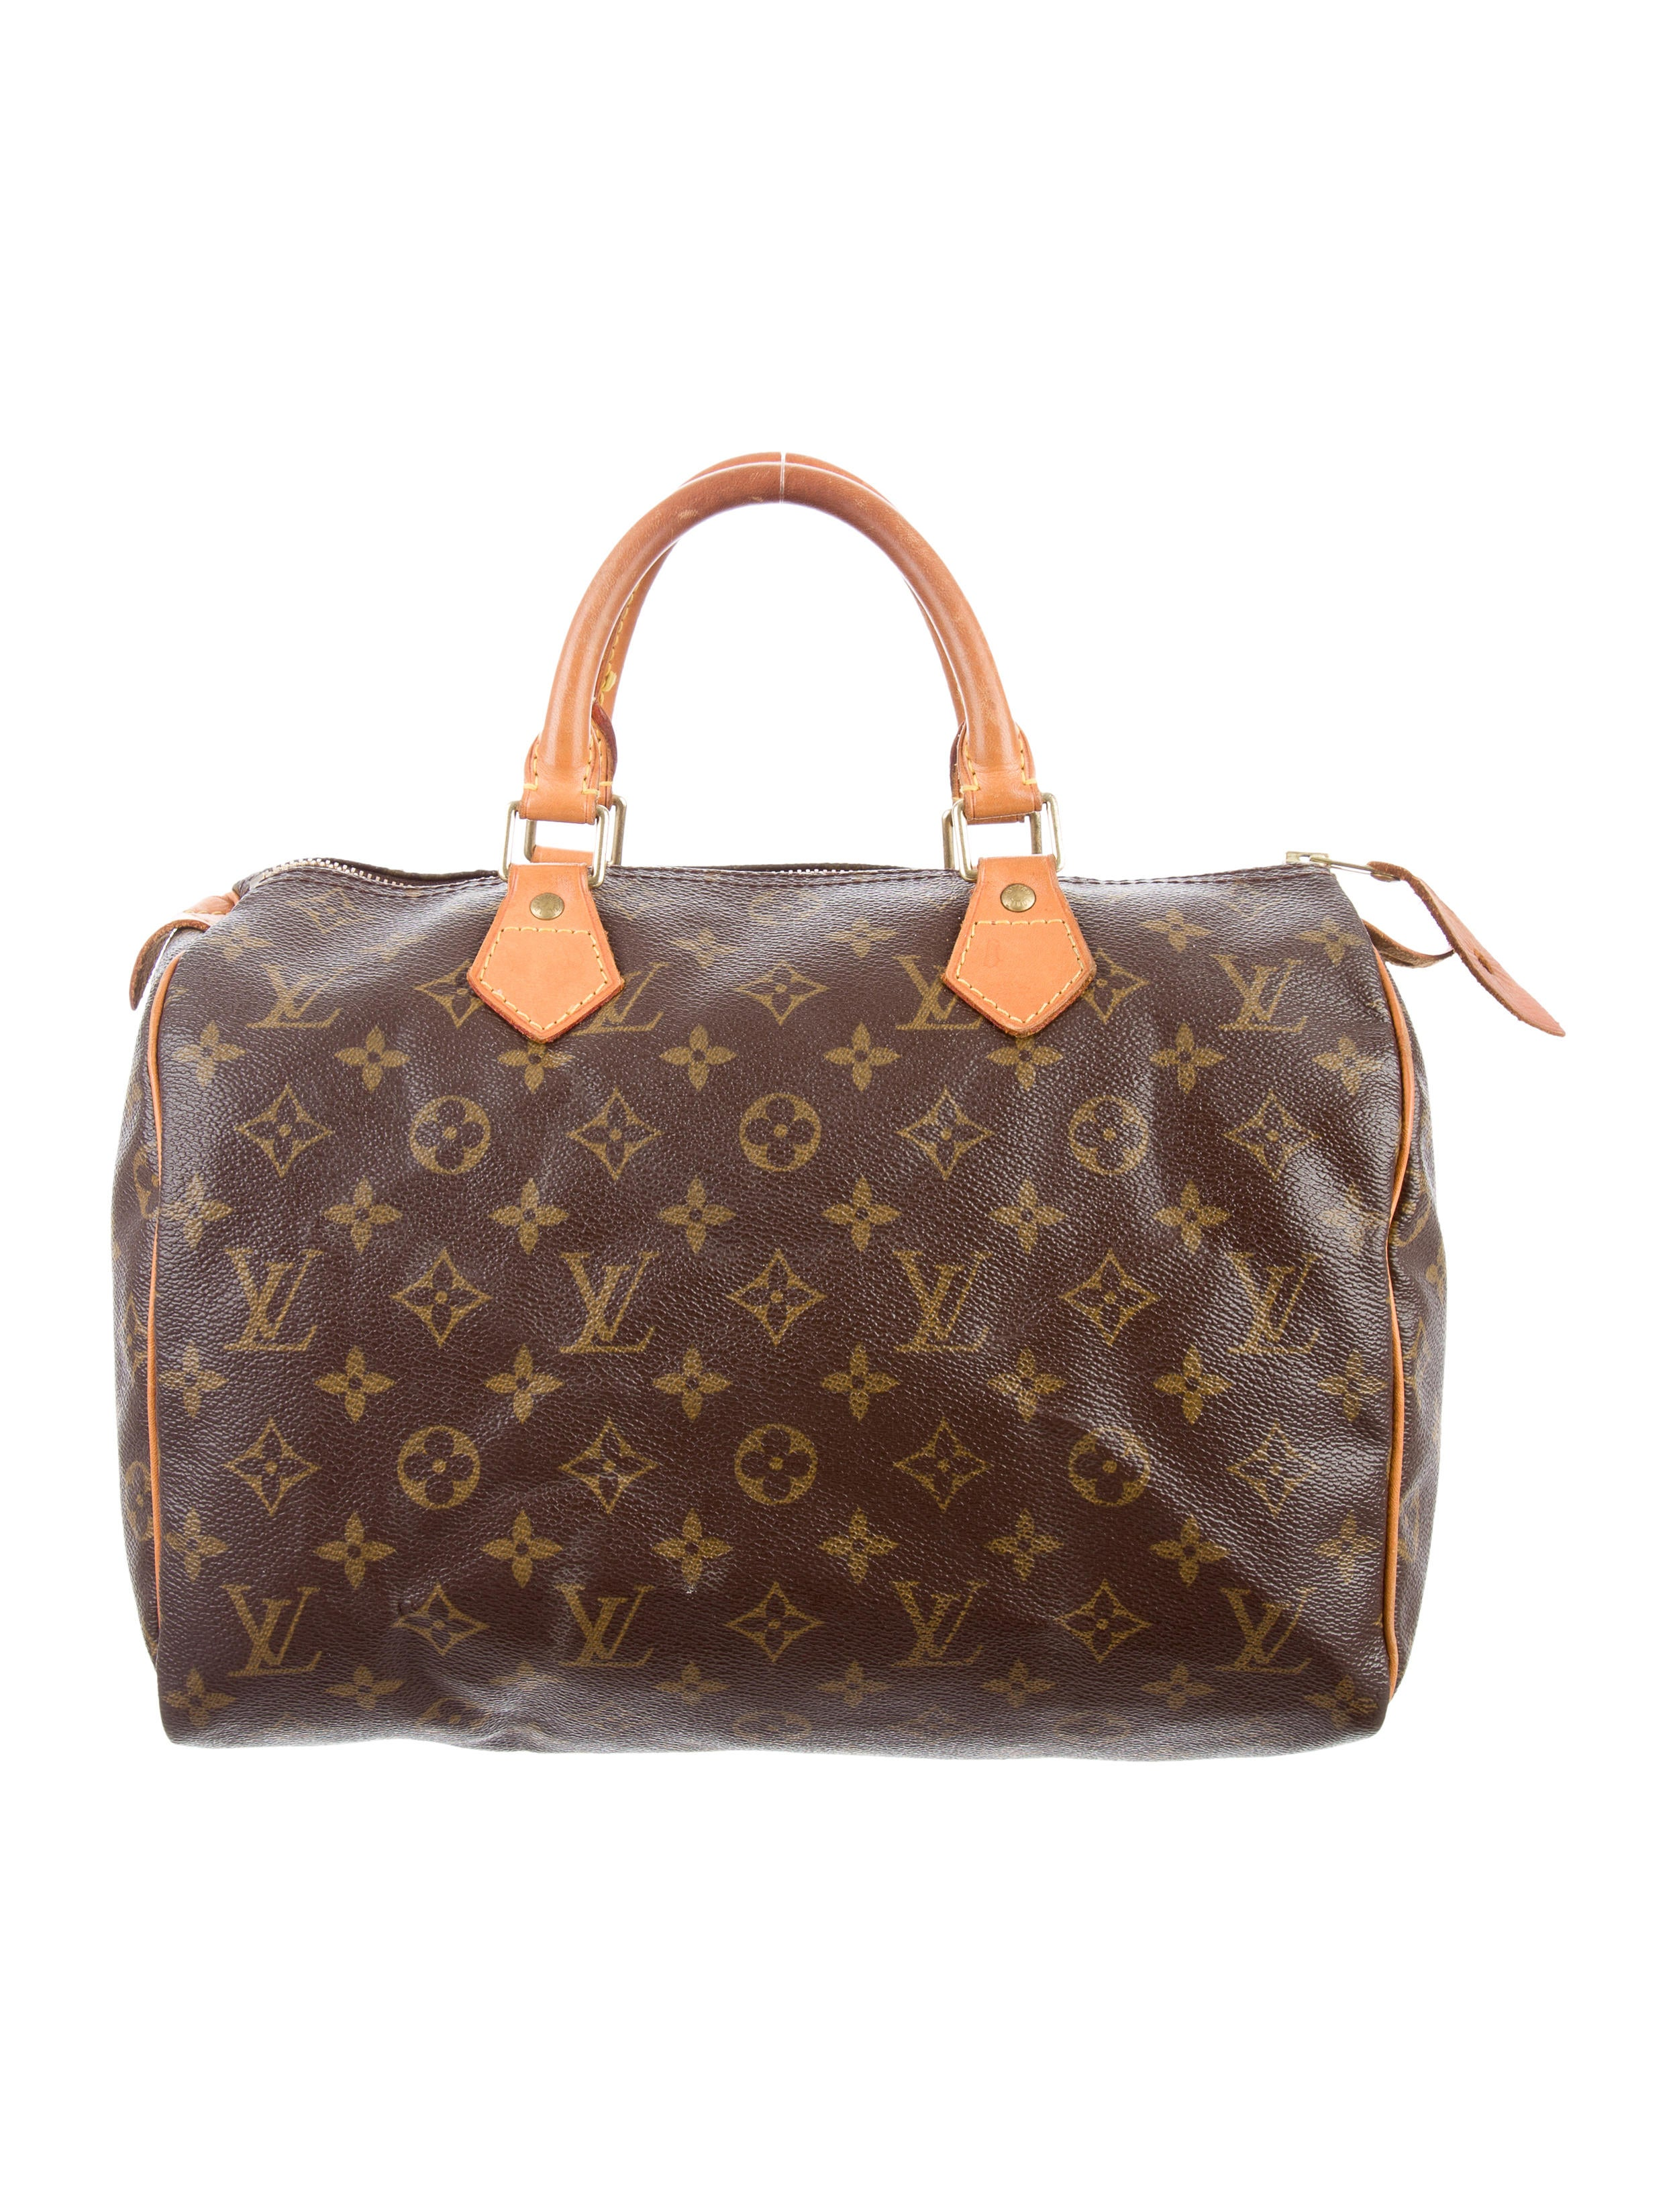 louis vuitton monogram speedy 30 handbags lou119079. Black Bedroom Furniture Sets. Home Design Ideas